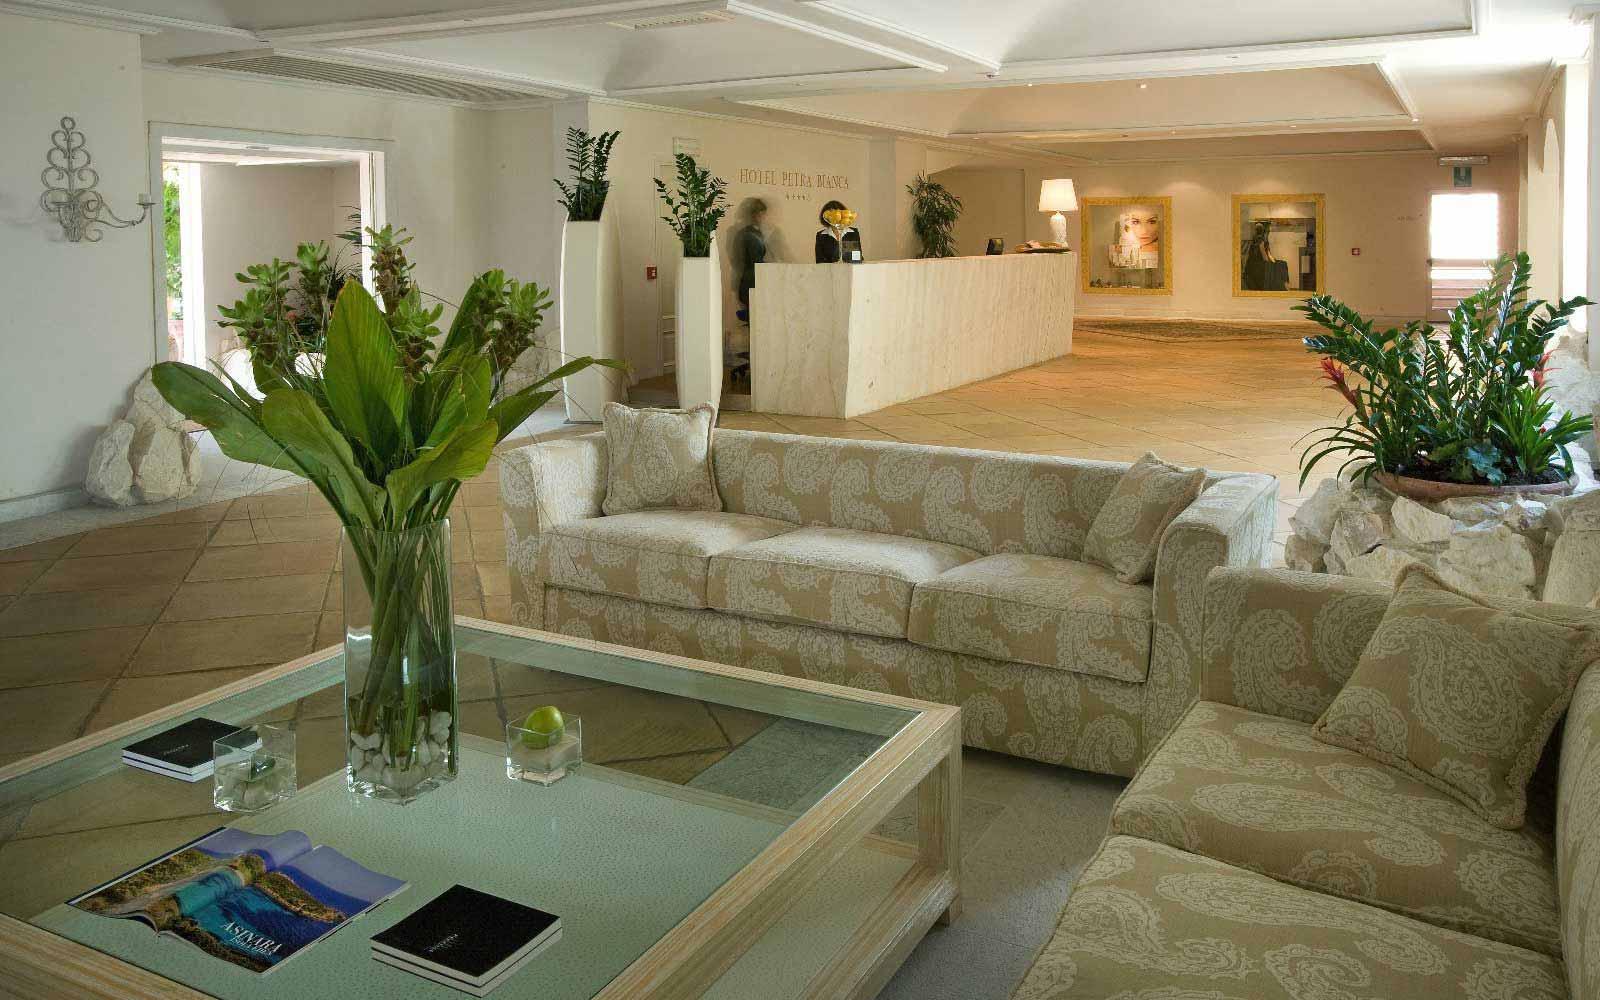 Reception hall at Hotel Petra Bianca